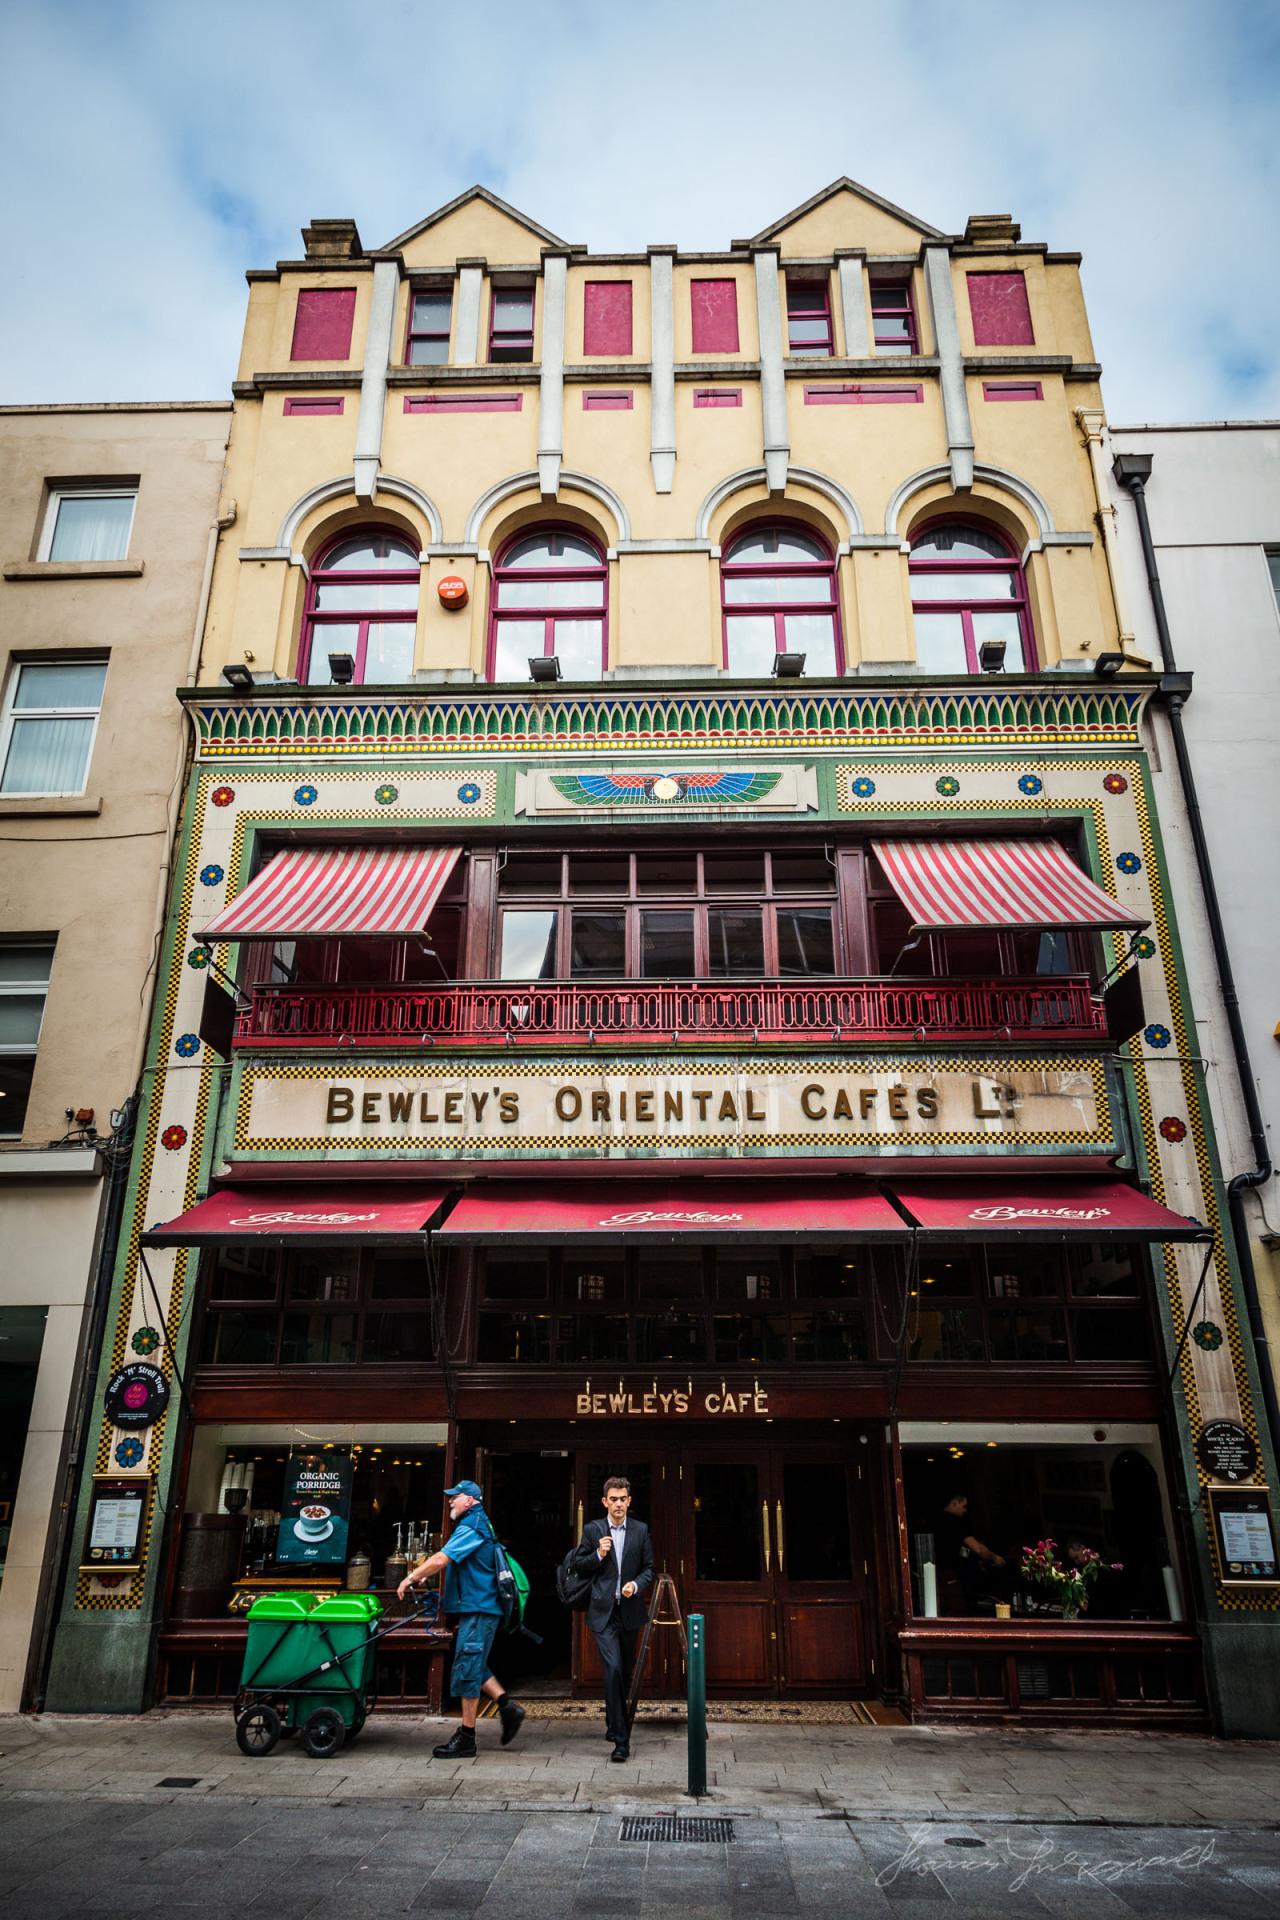 Bewleys cafe